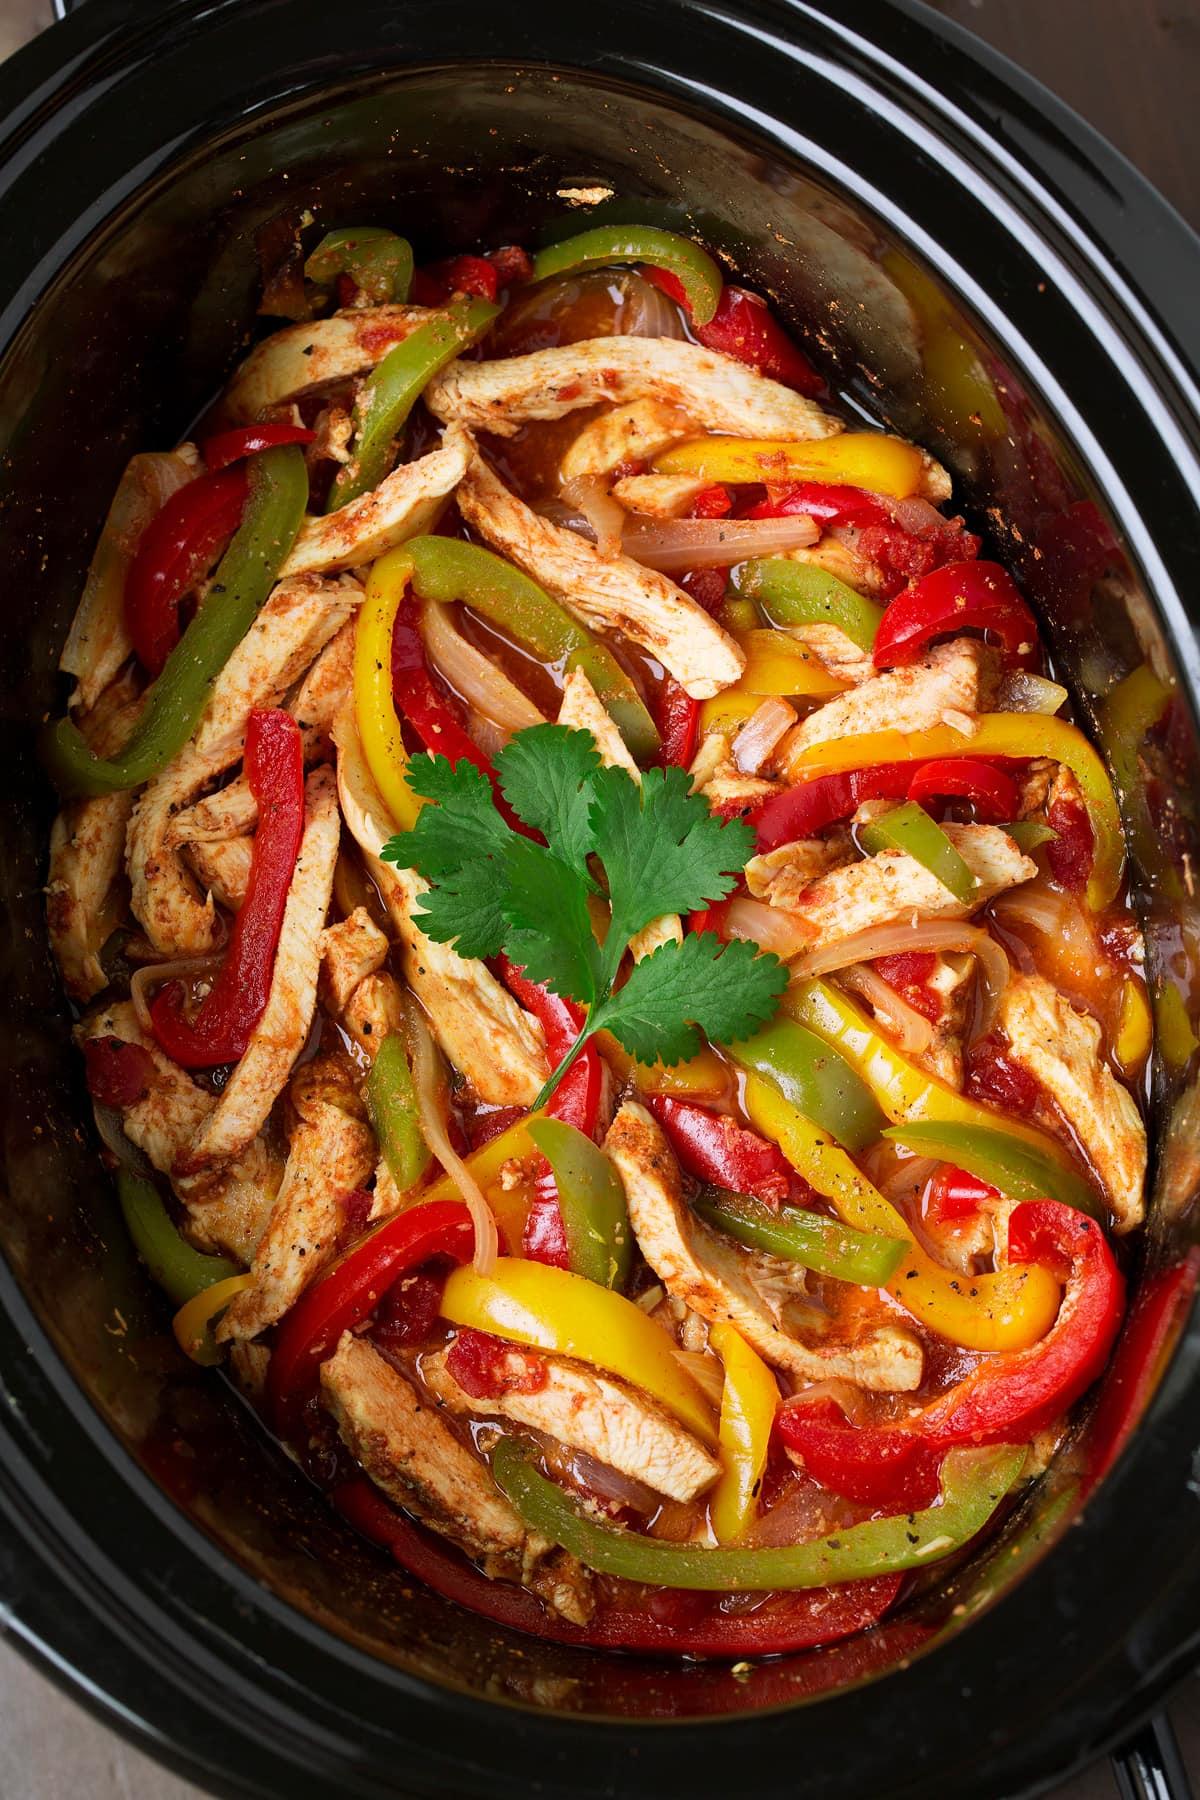 Crockpot Chicken Fajitas